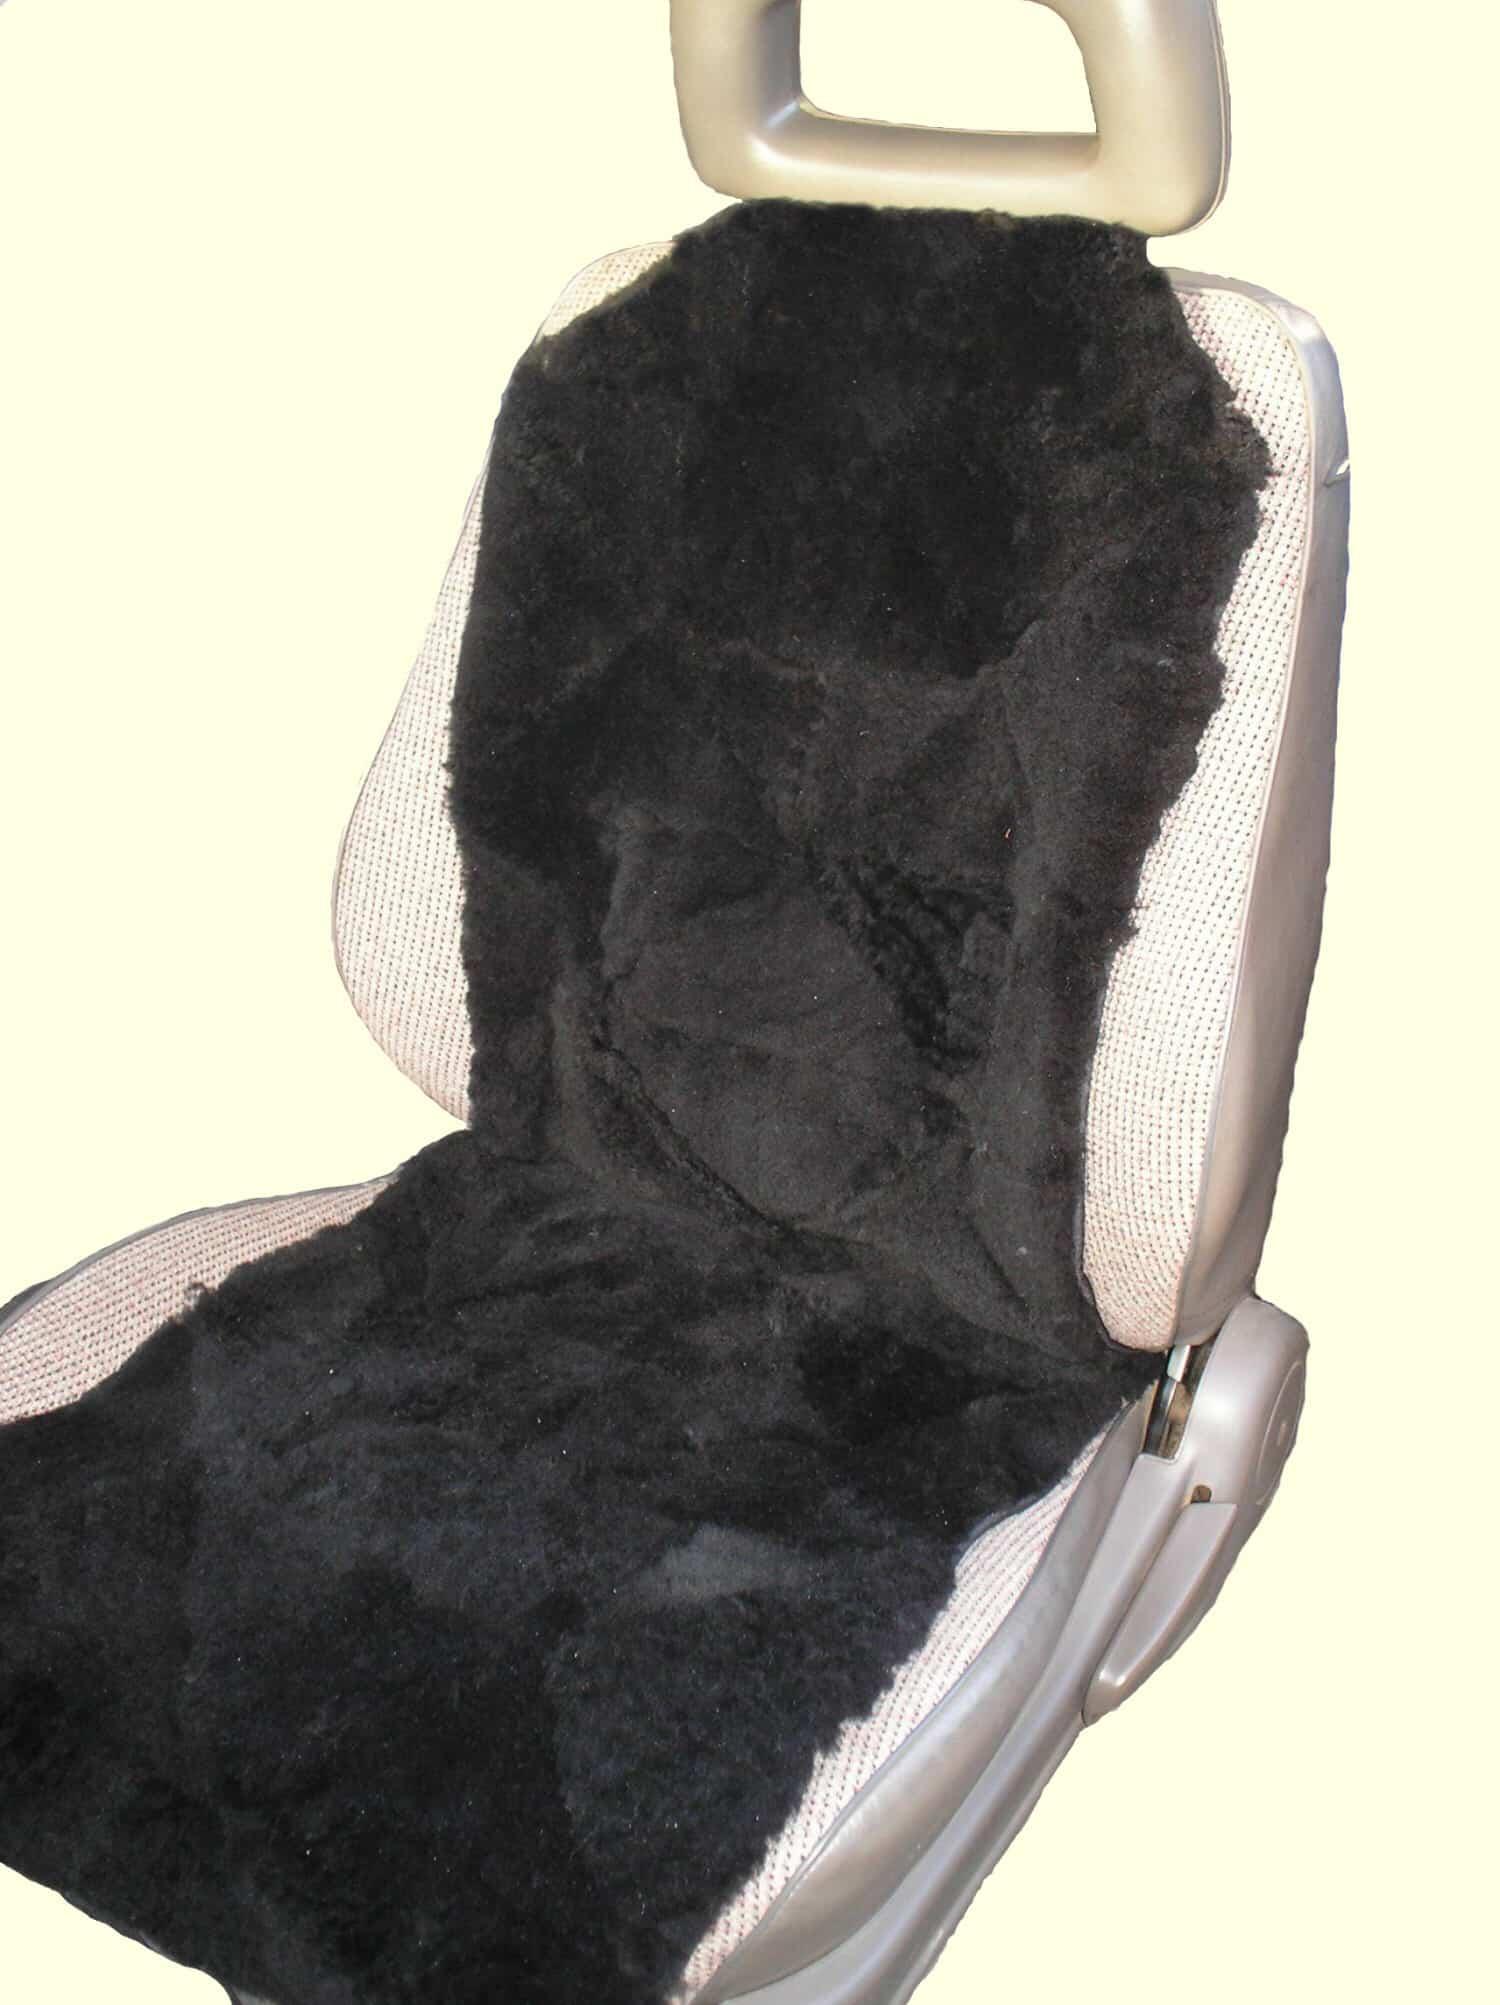 new patchwork sheepskin insert car seat cover ebay. Black Bedroom Furniture Sets. Home Design Ideas